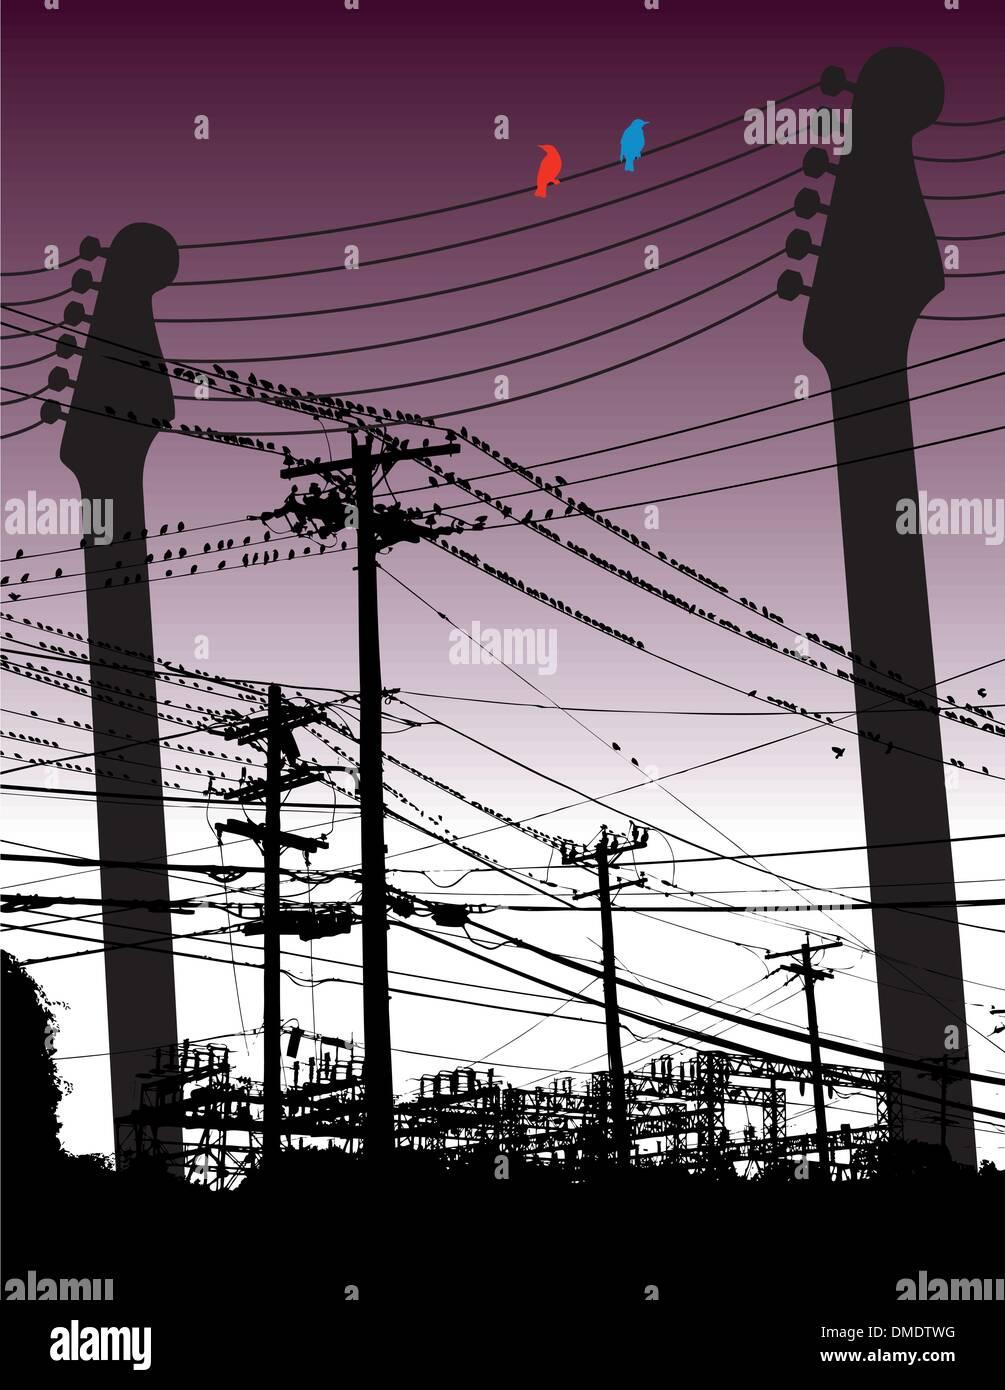 An electric guitar among birds and telephone poles - Stock Vector